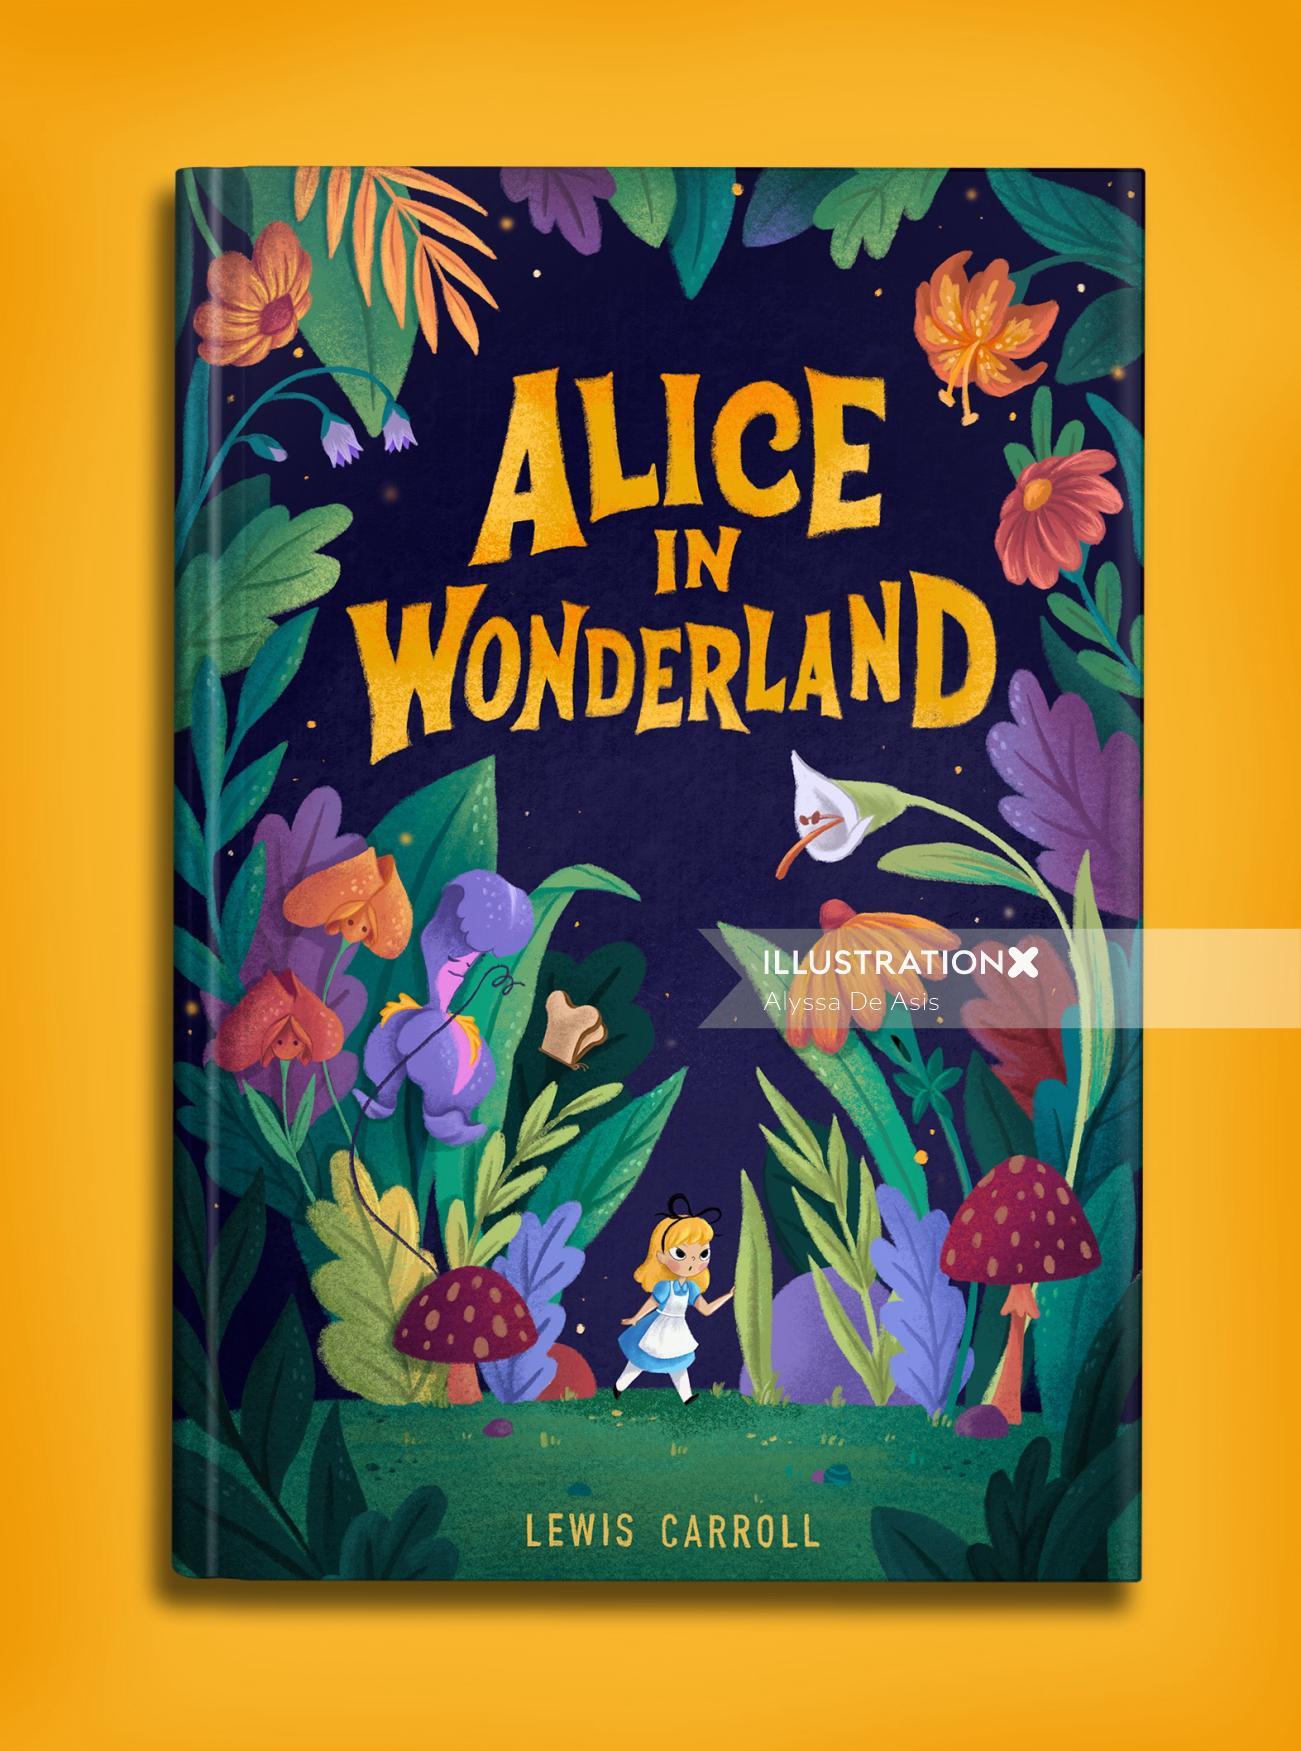 Book Covers Alice in Wonderland